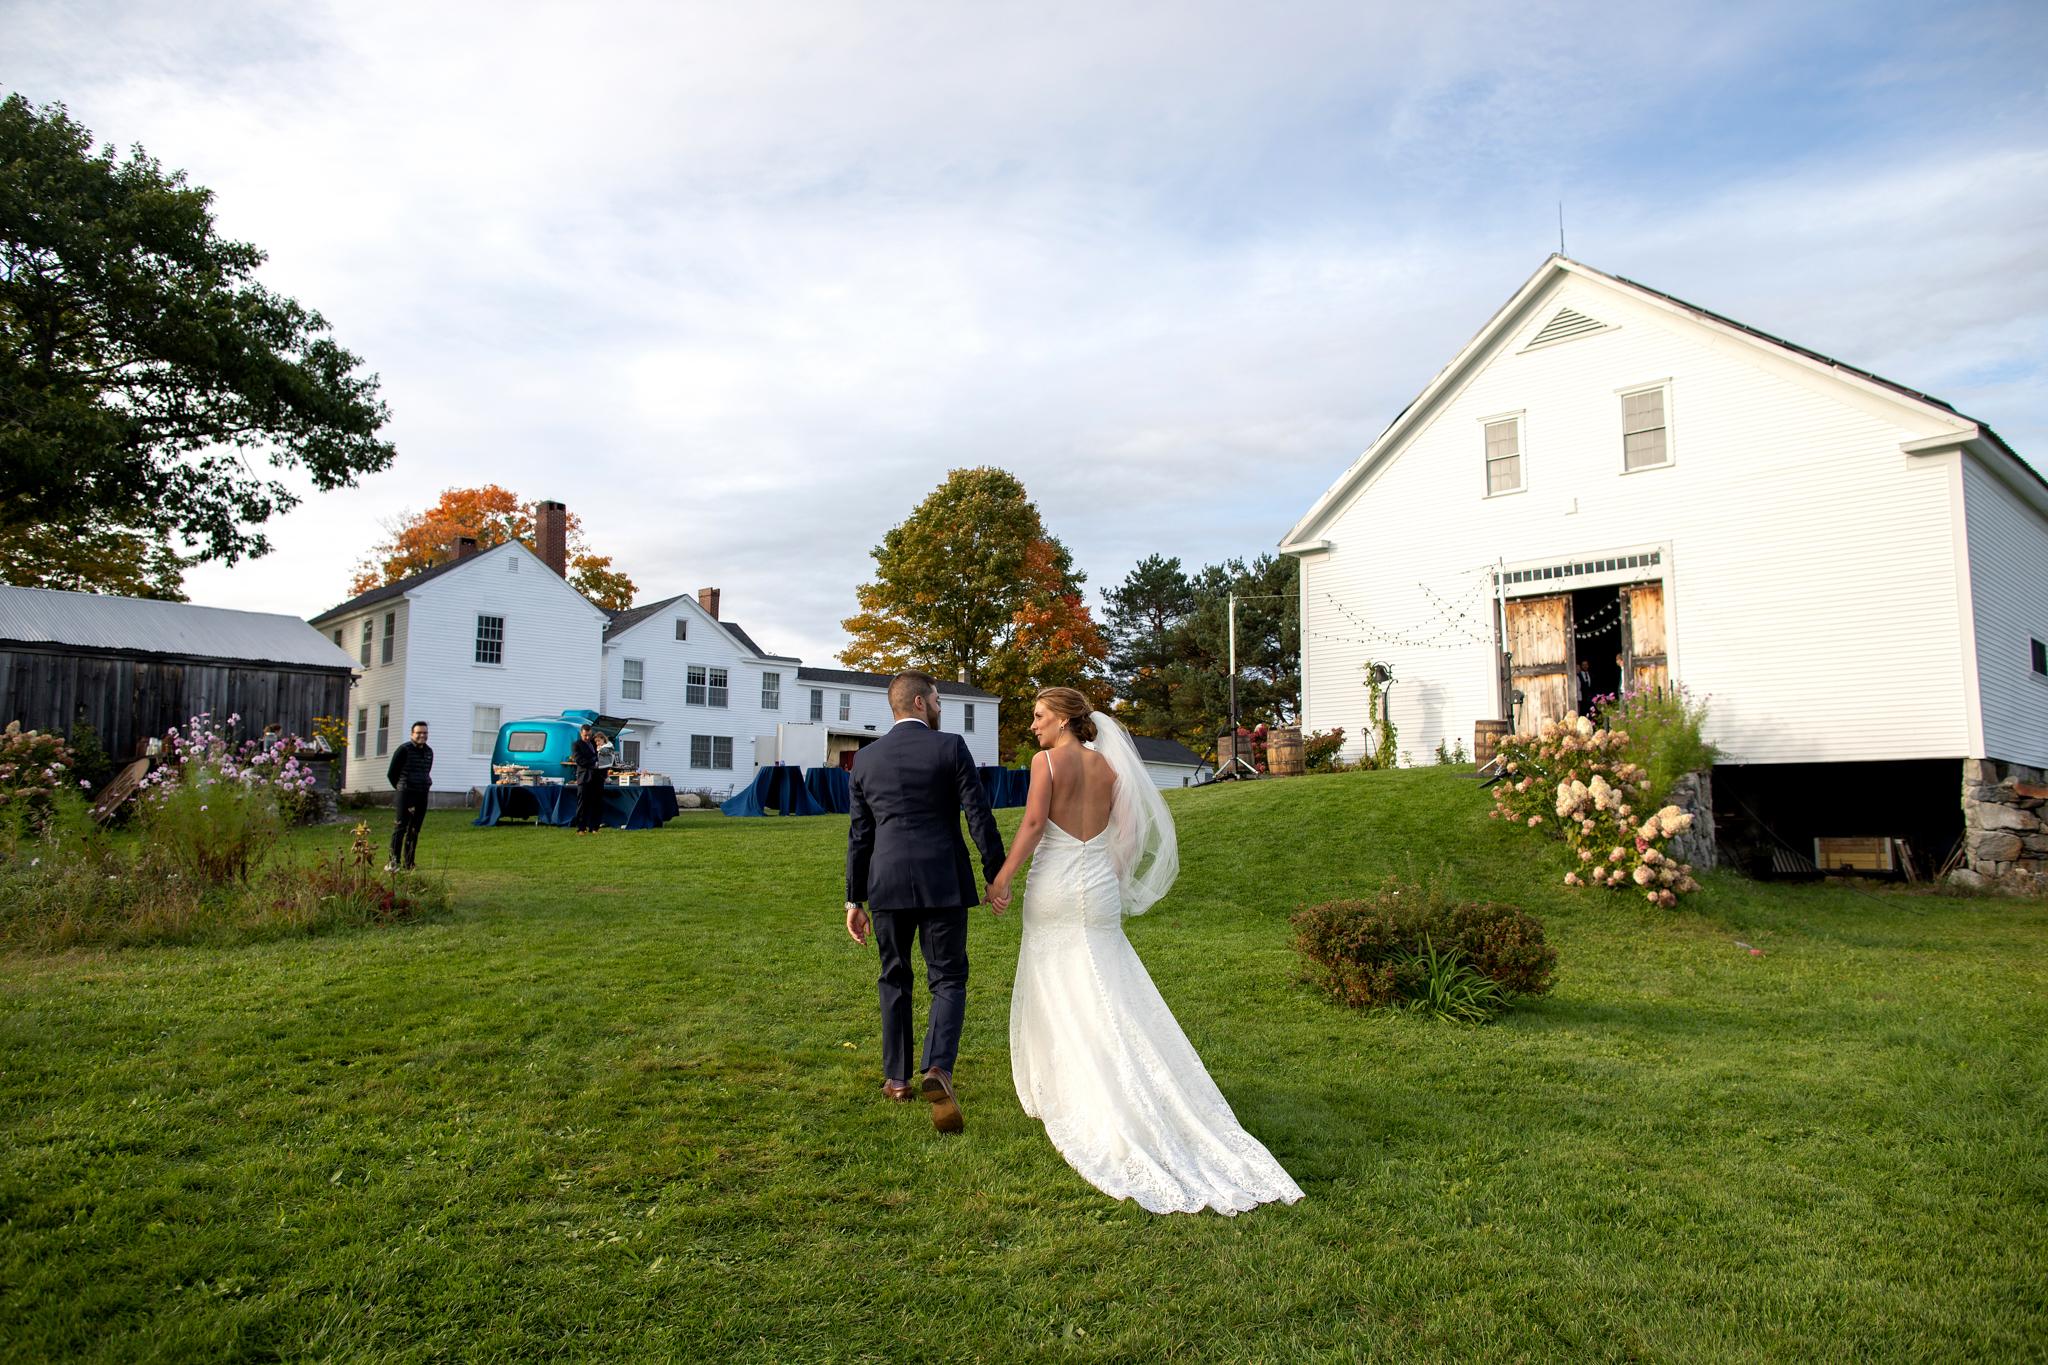 maine-farm-wedding-photographer-stepheneycollins-153.jpg